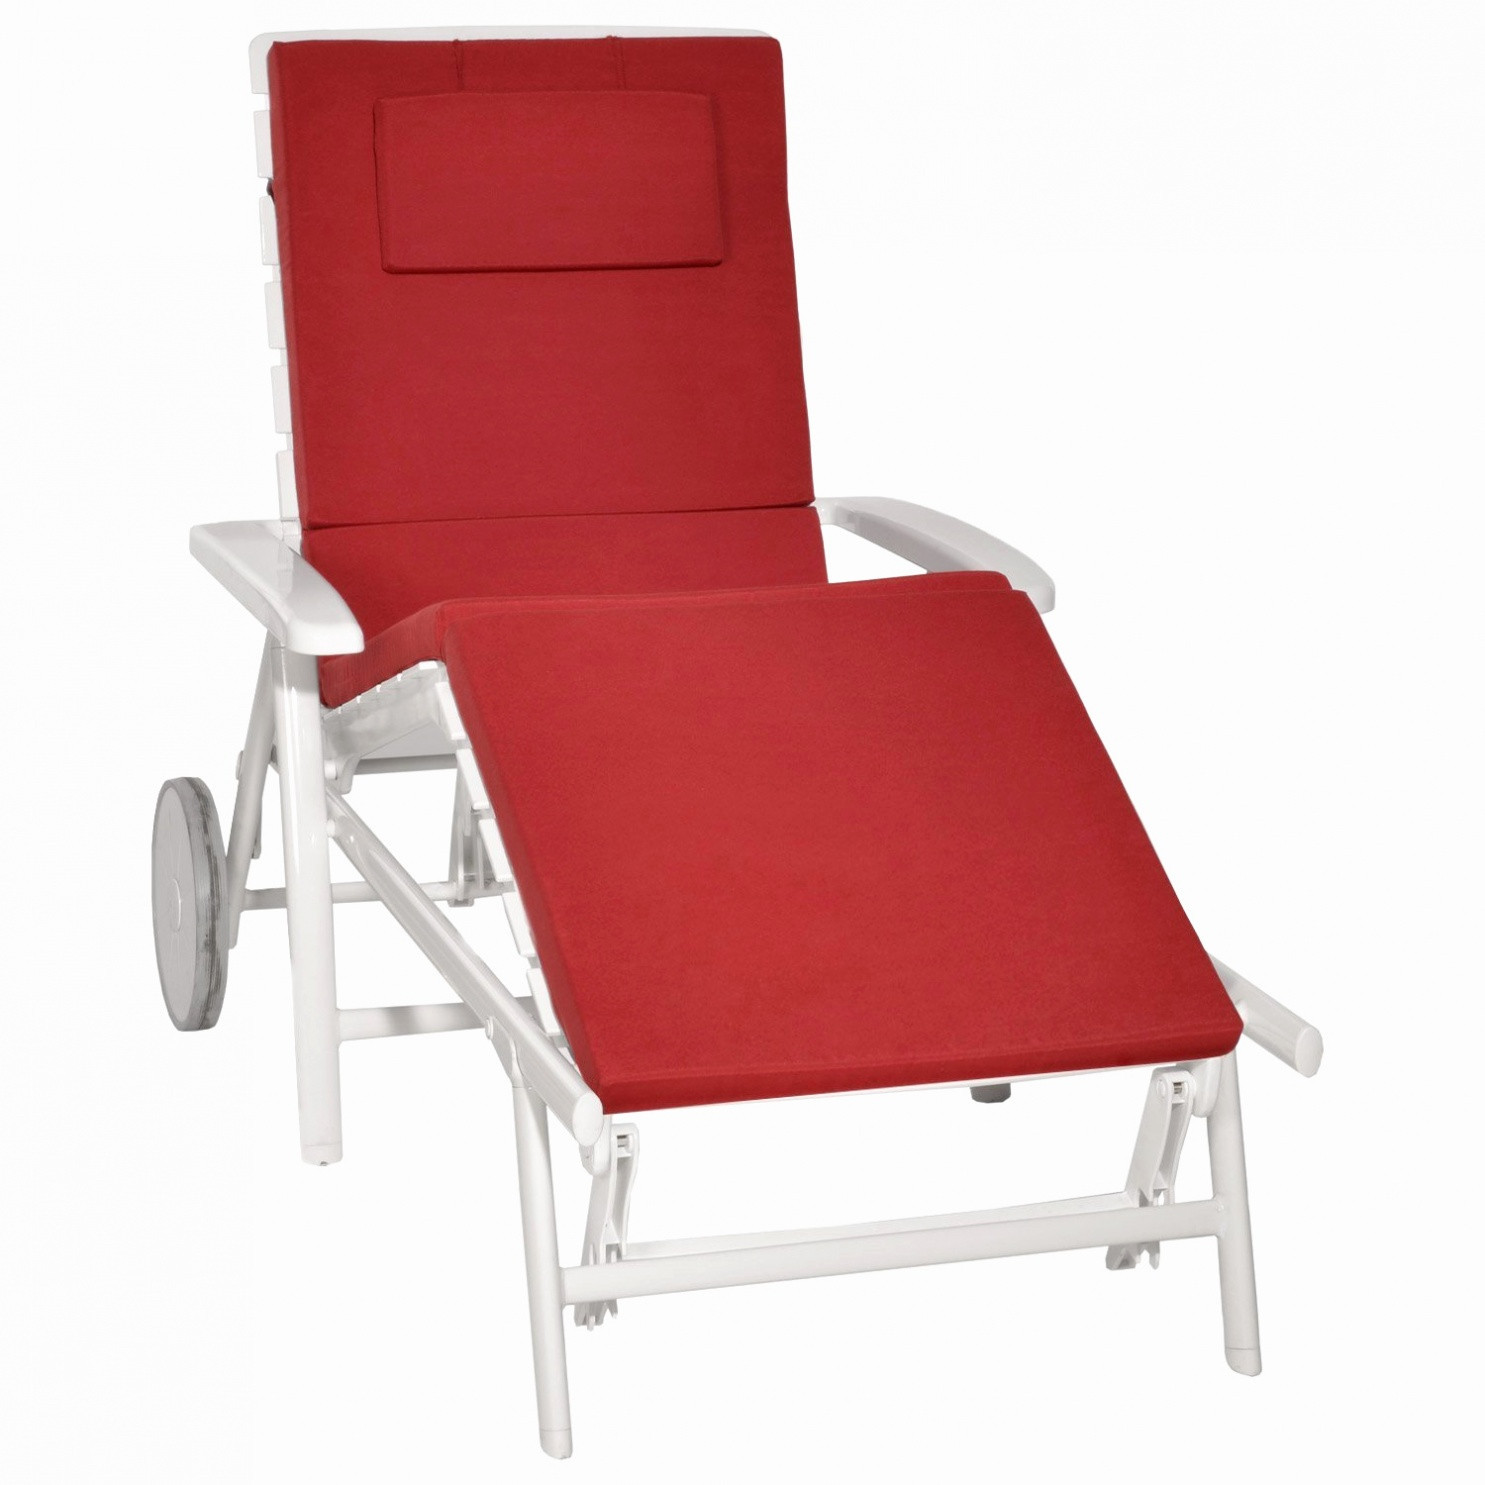 fauteuil relax lafuma elegant chaises longues lafuma of fauteuil relax lafuma